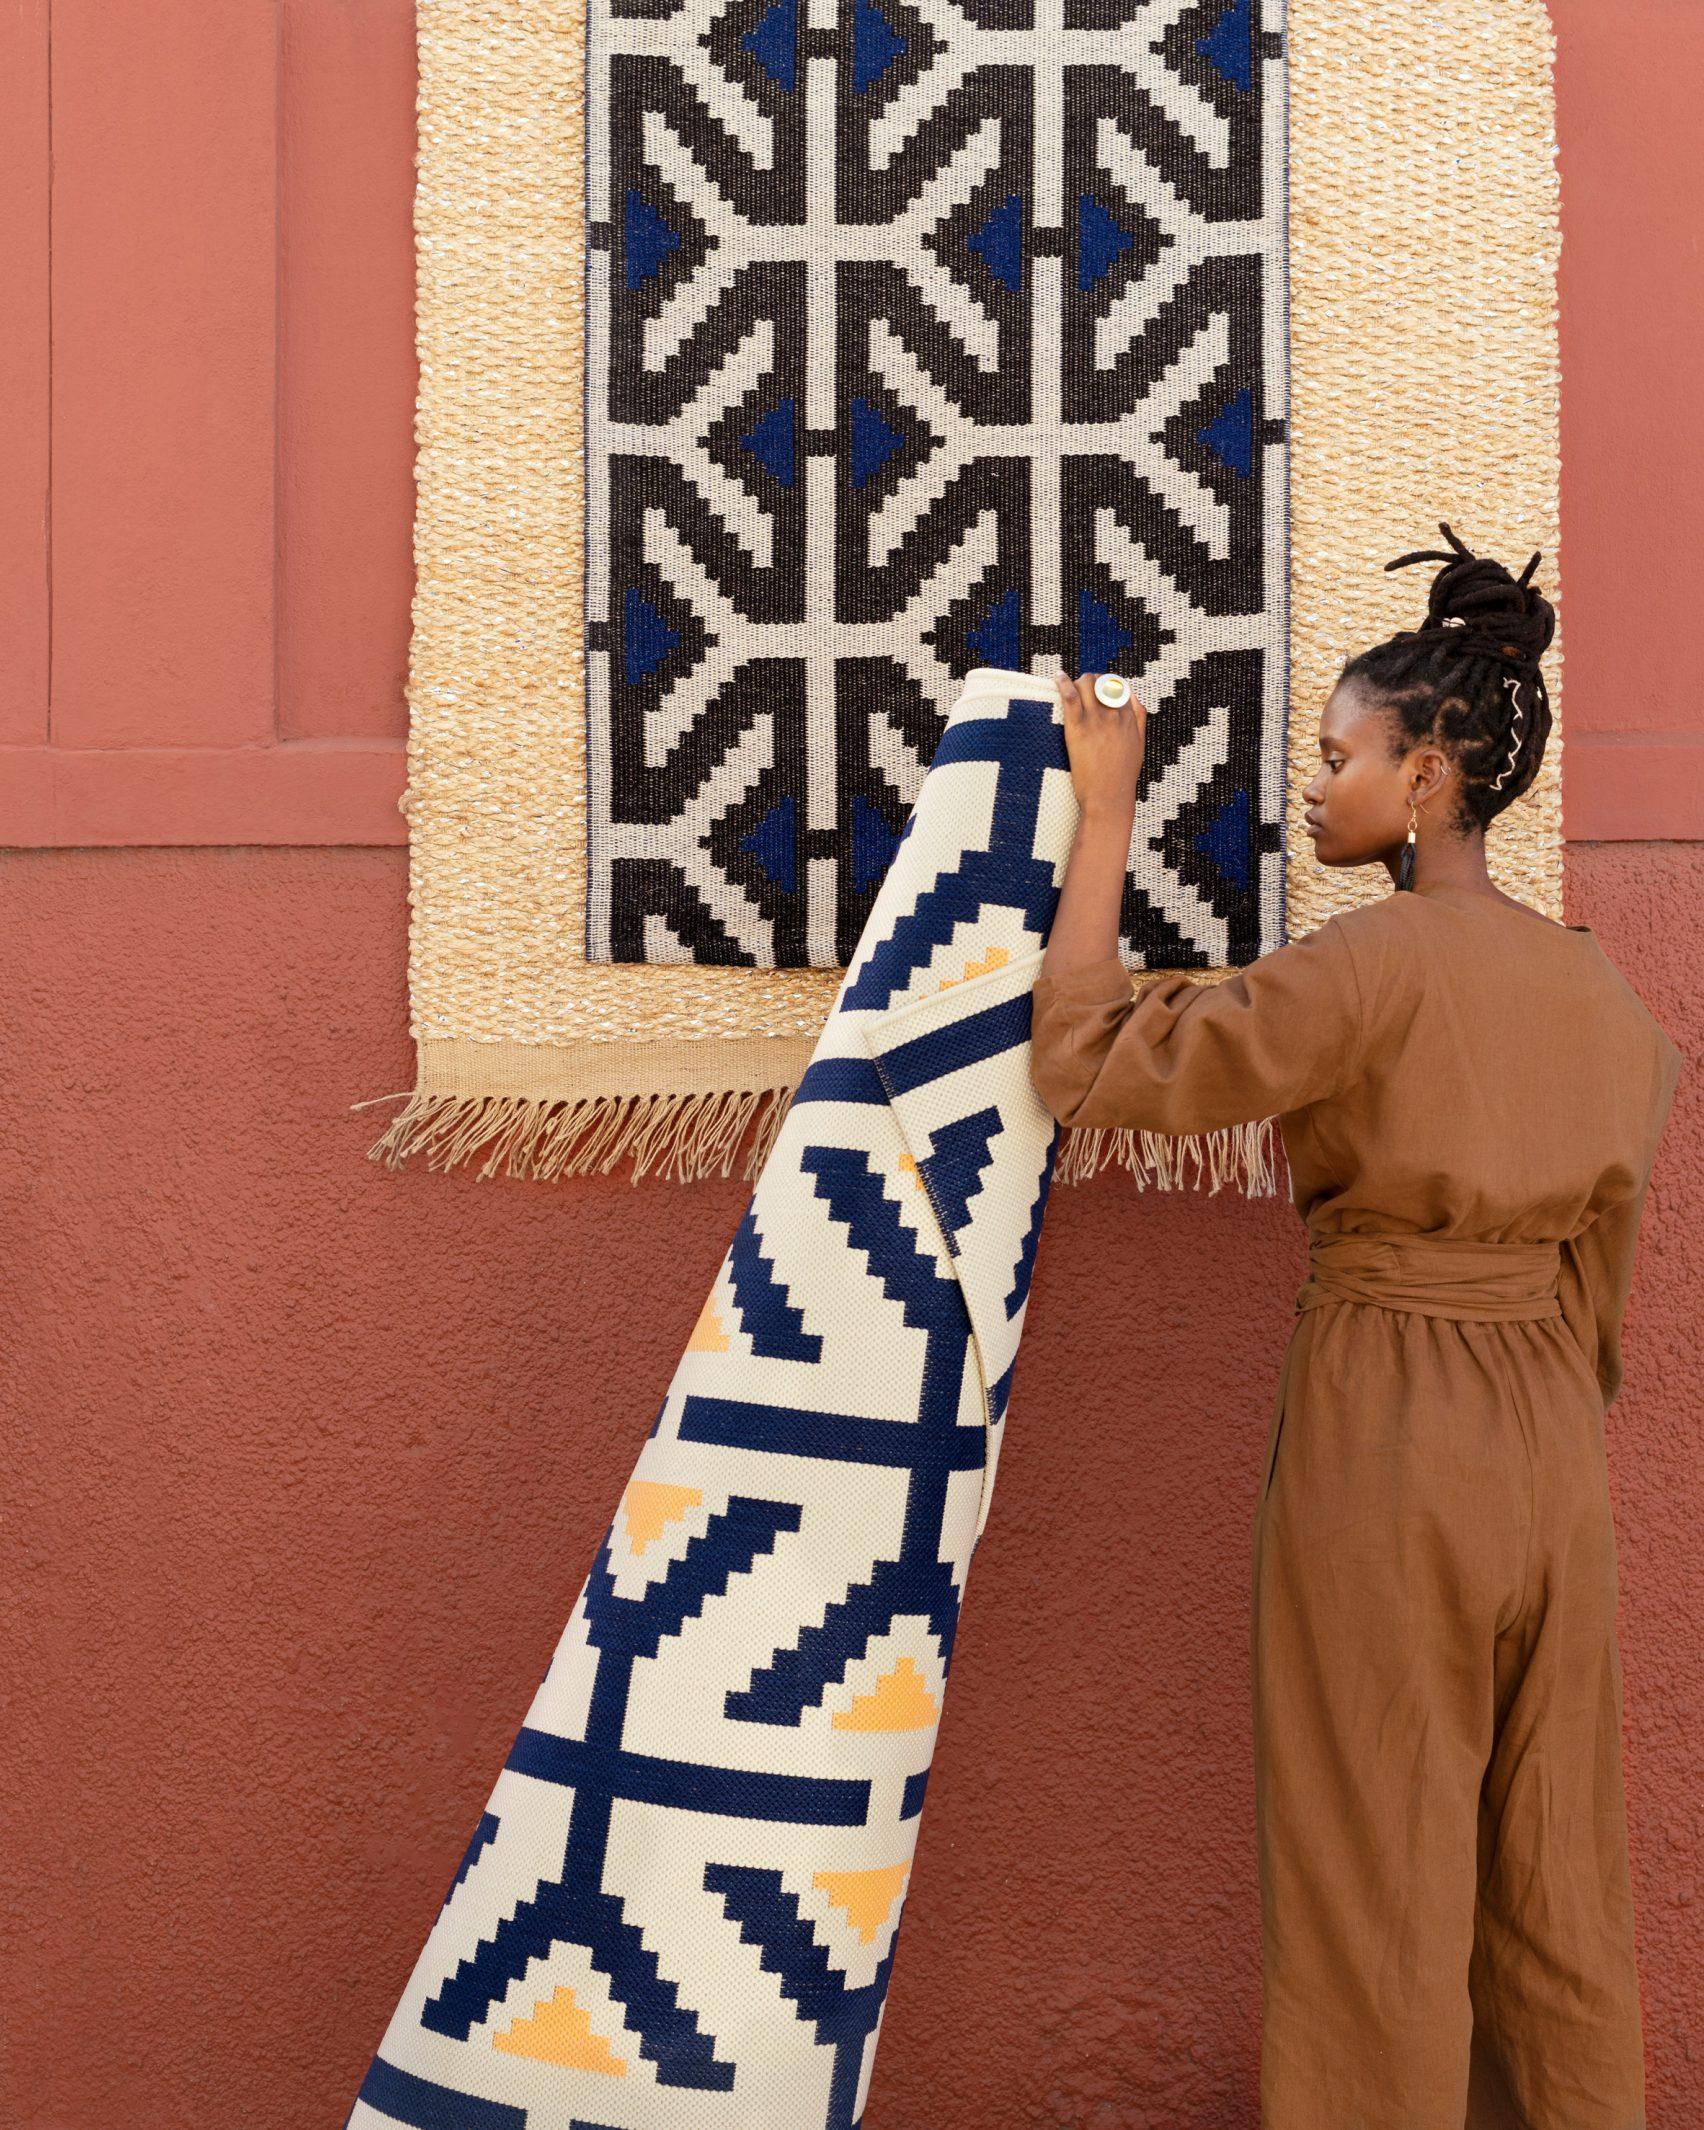 design indaba x ikea ÖVERALLT 10 african creatives - rug by ladumangxokolo.jpg